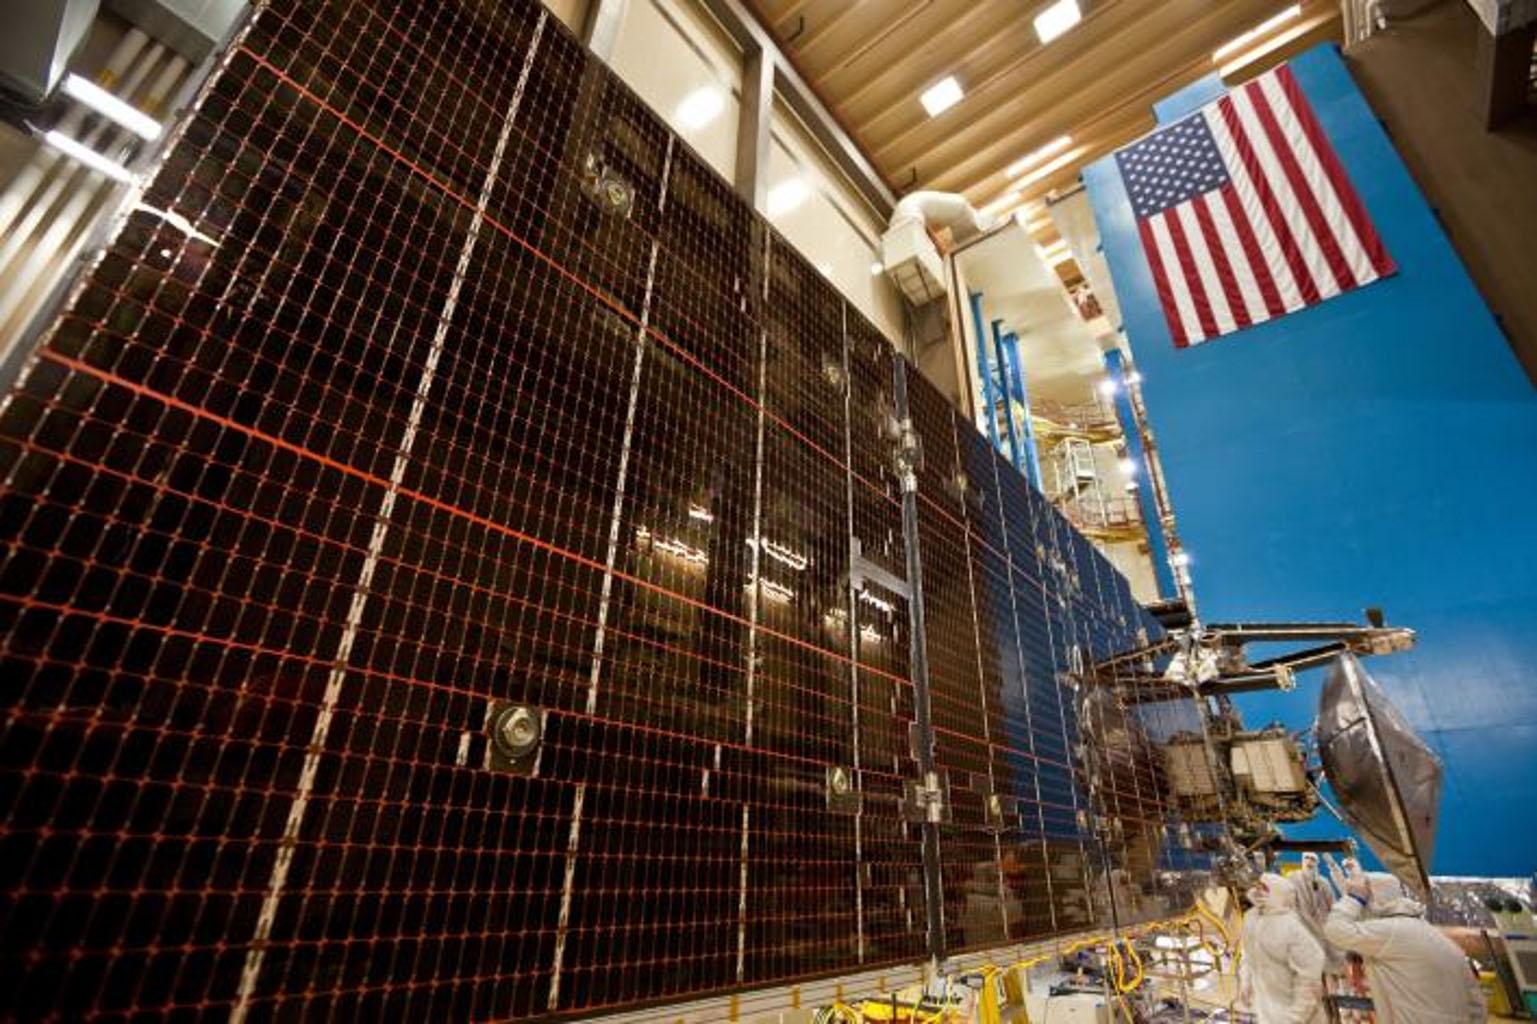 spacecraft solar array panels - photo #21